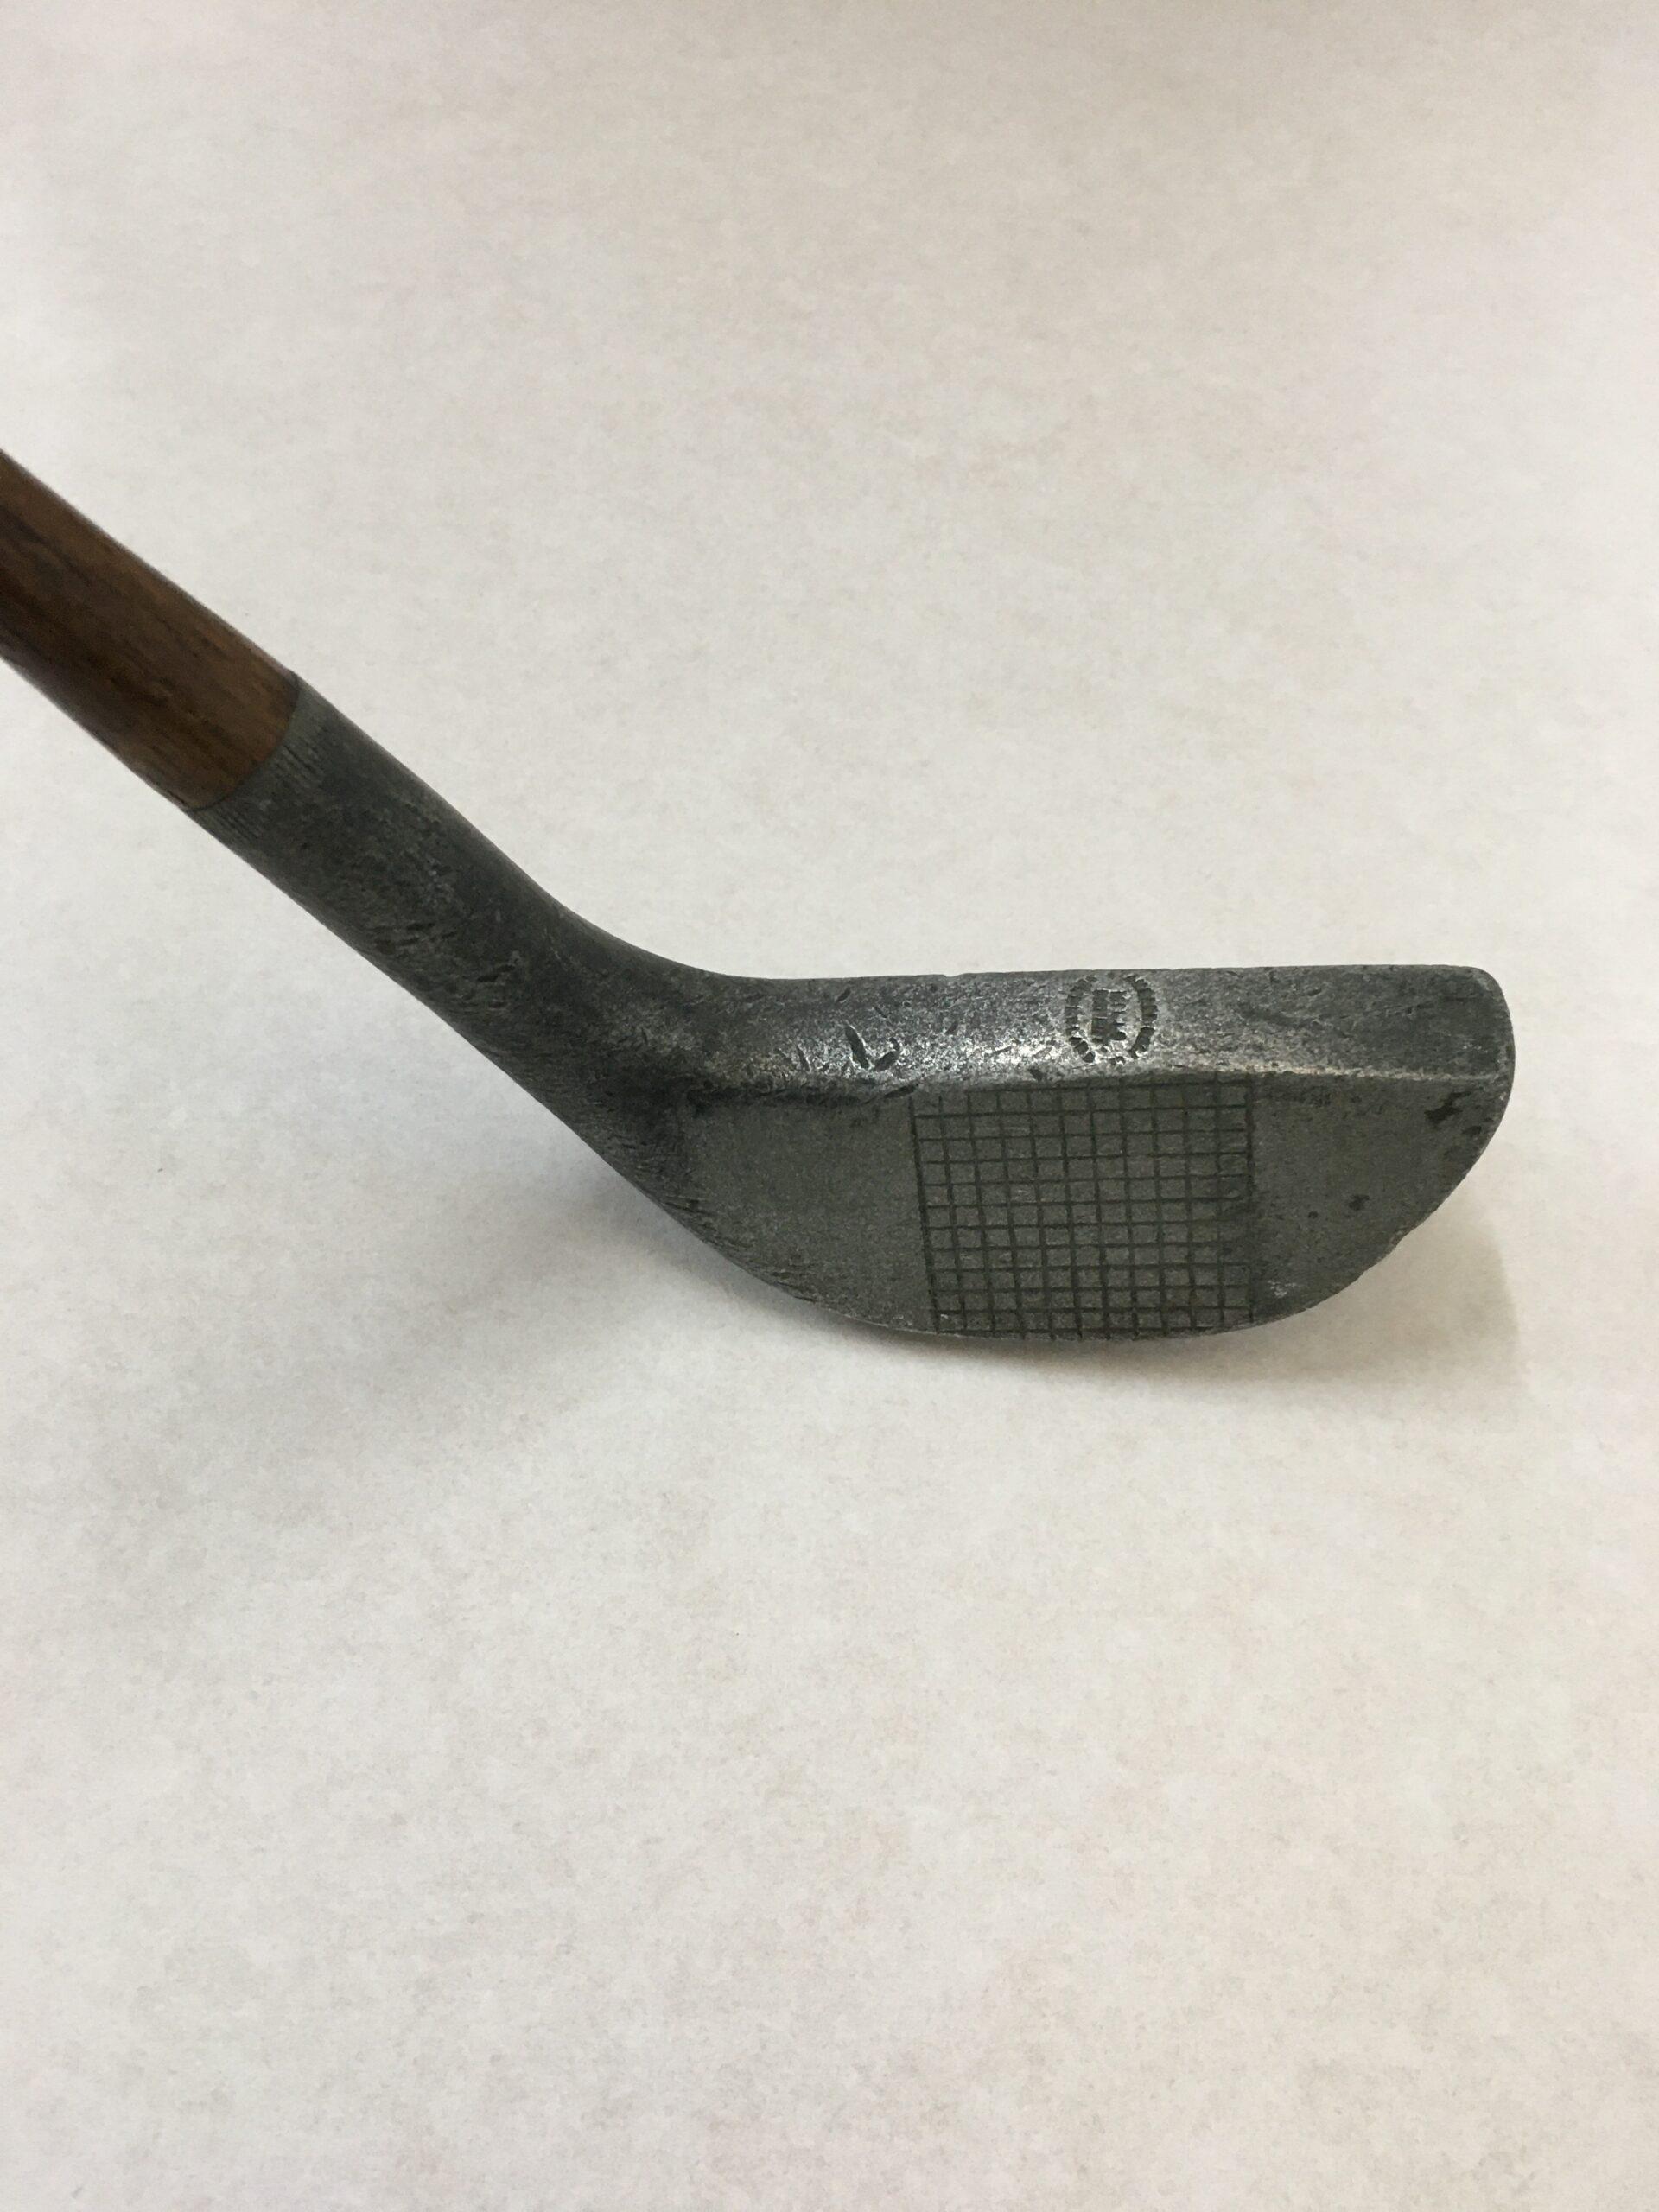 Standard Golf Co. 'The Duplex' RL 1 1/2 Aluminium wood